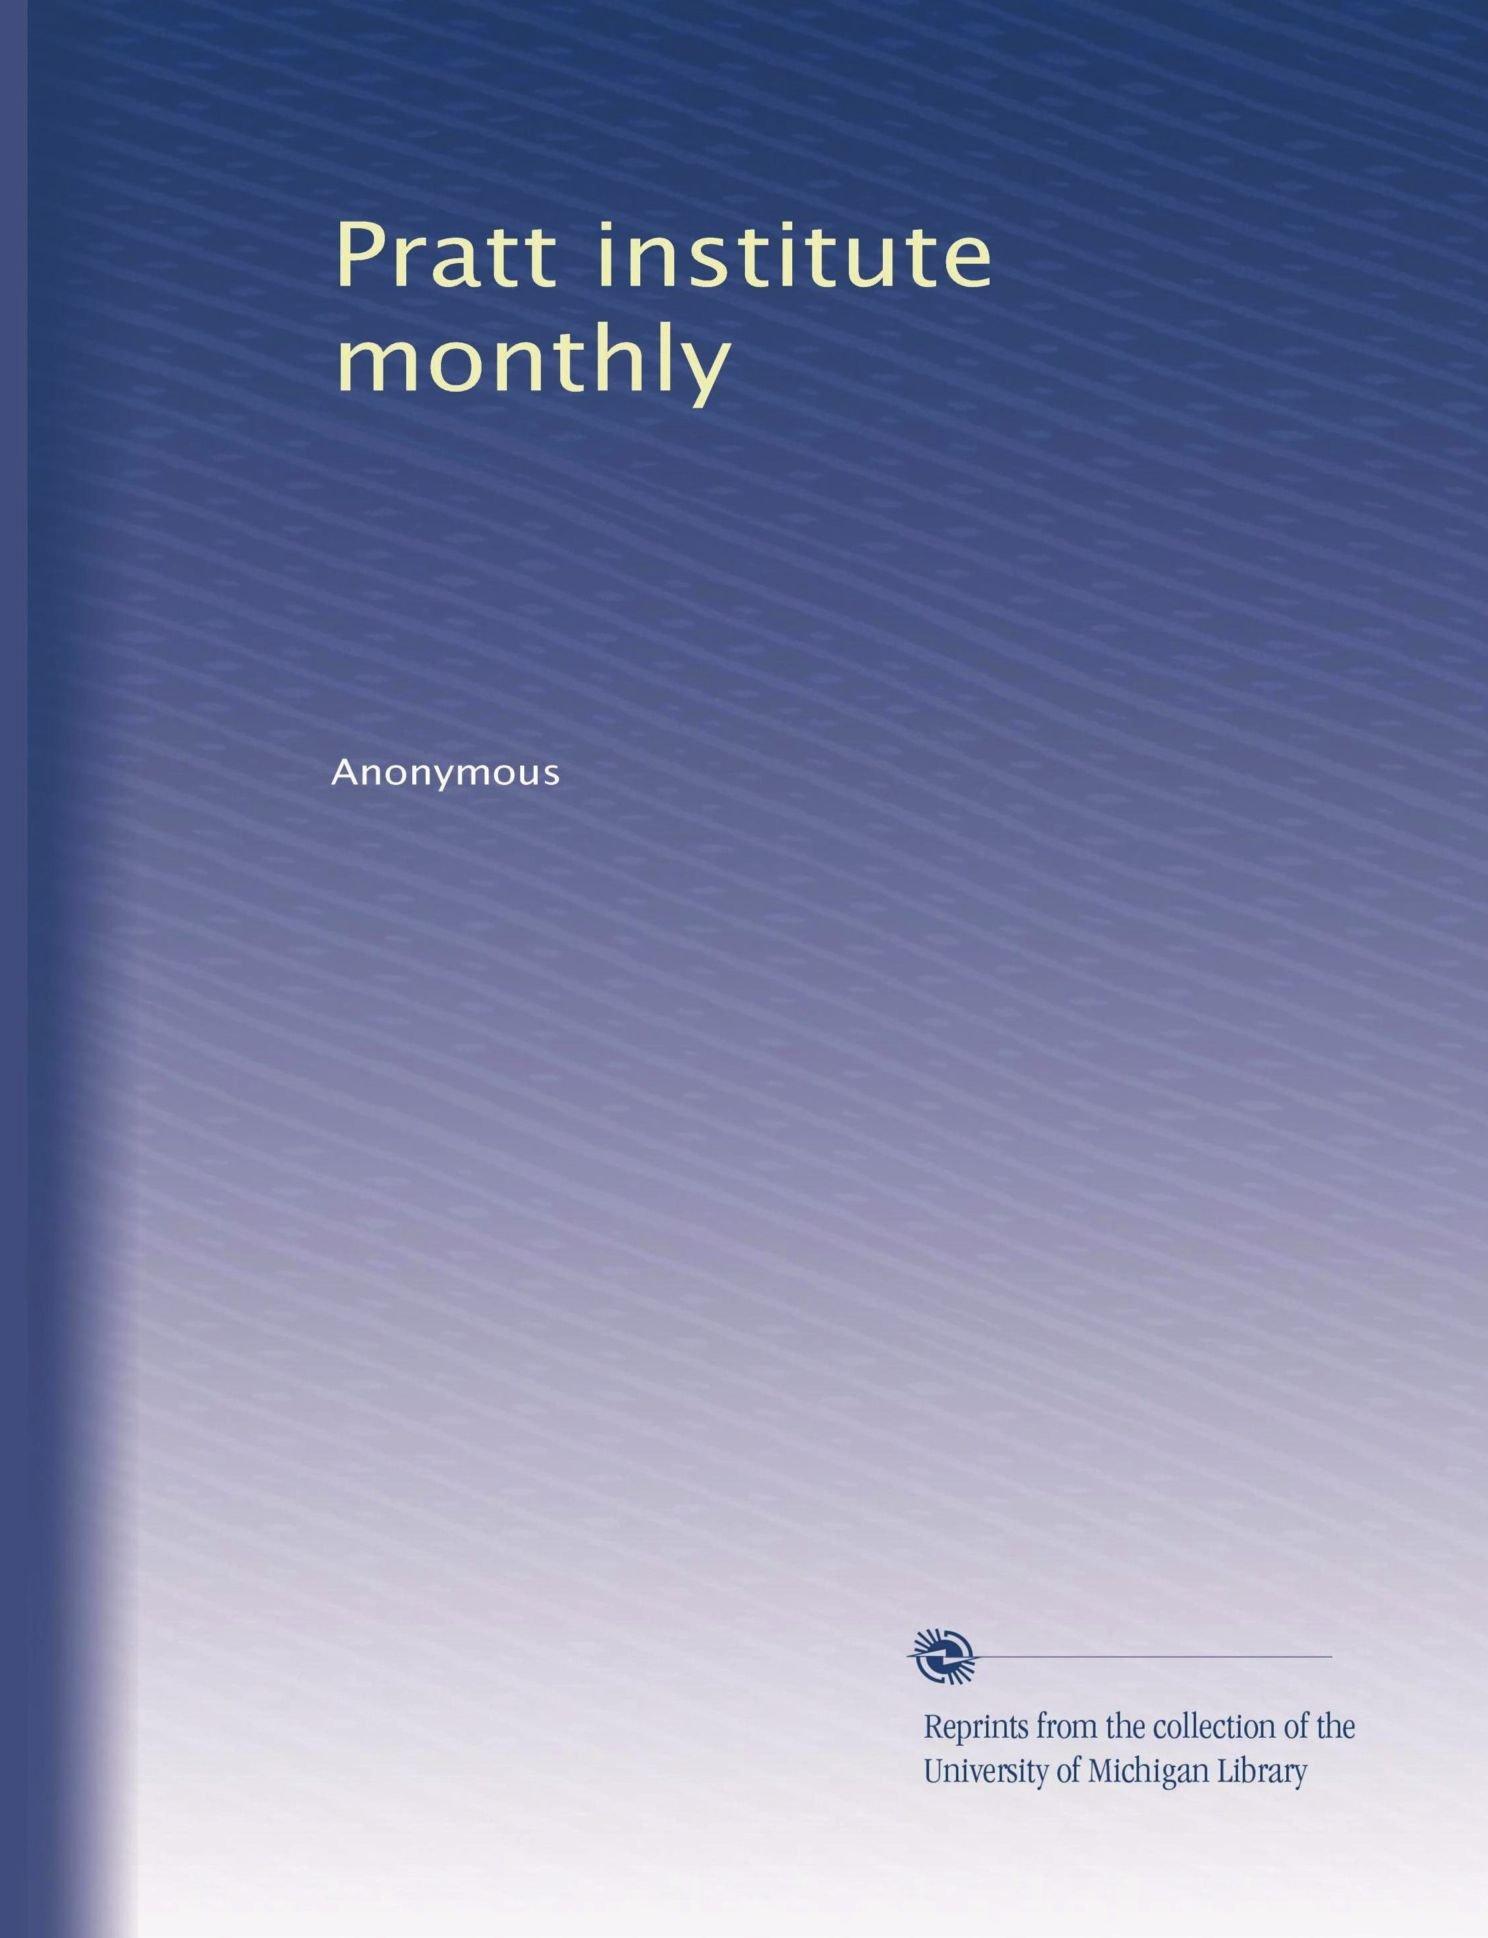 Download Pratt institute monthly (Volume 5) PDF